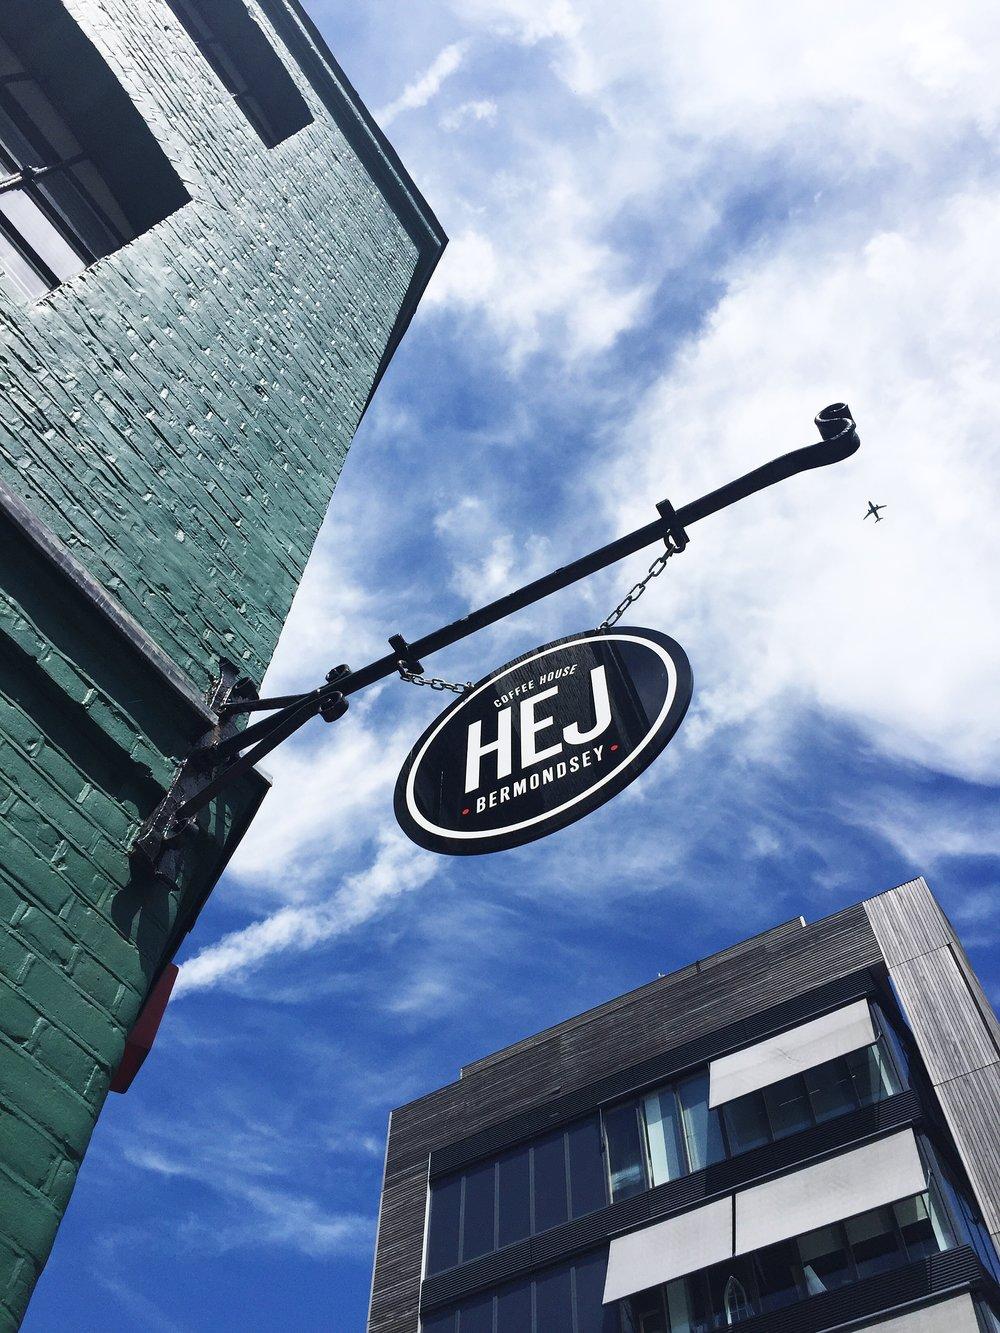 HEJ Coffee Shop in Bermondsey